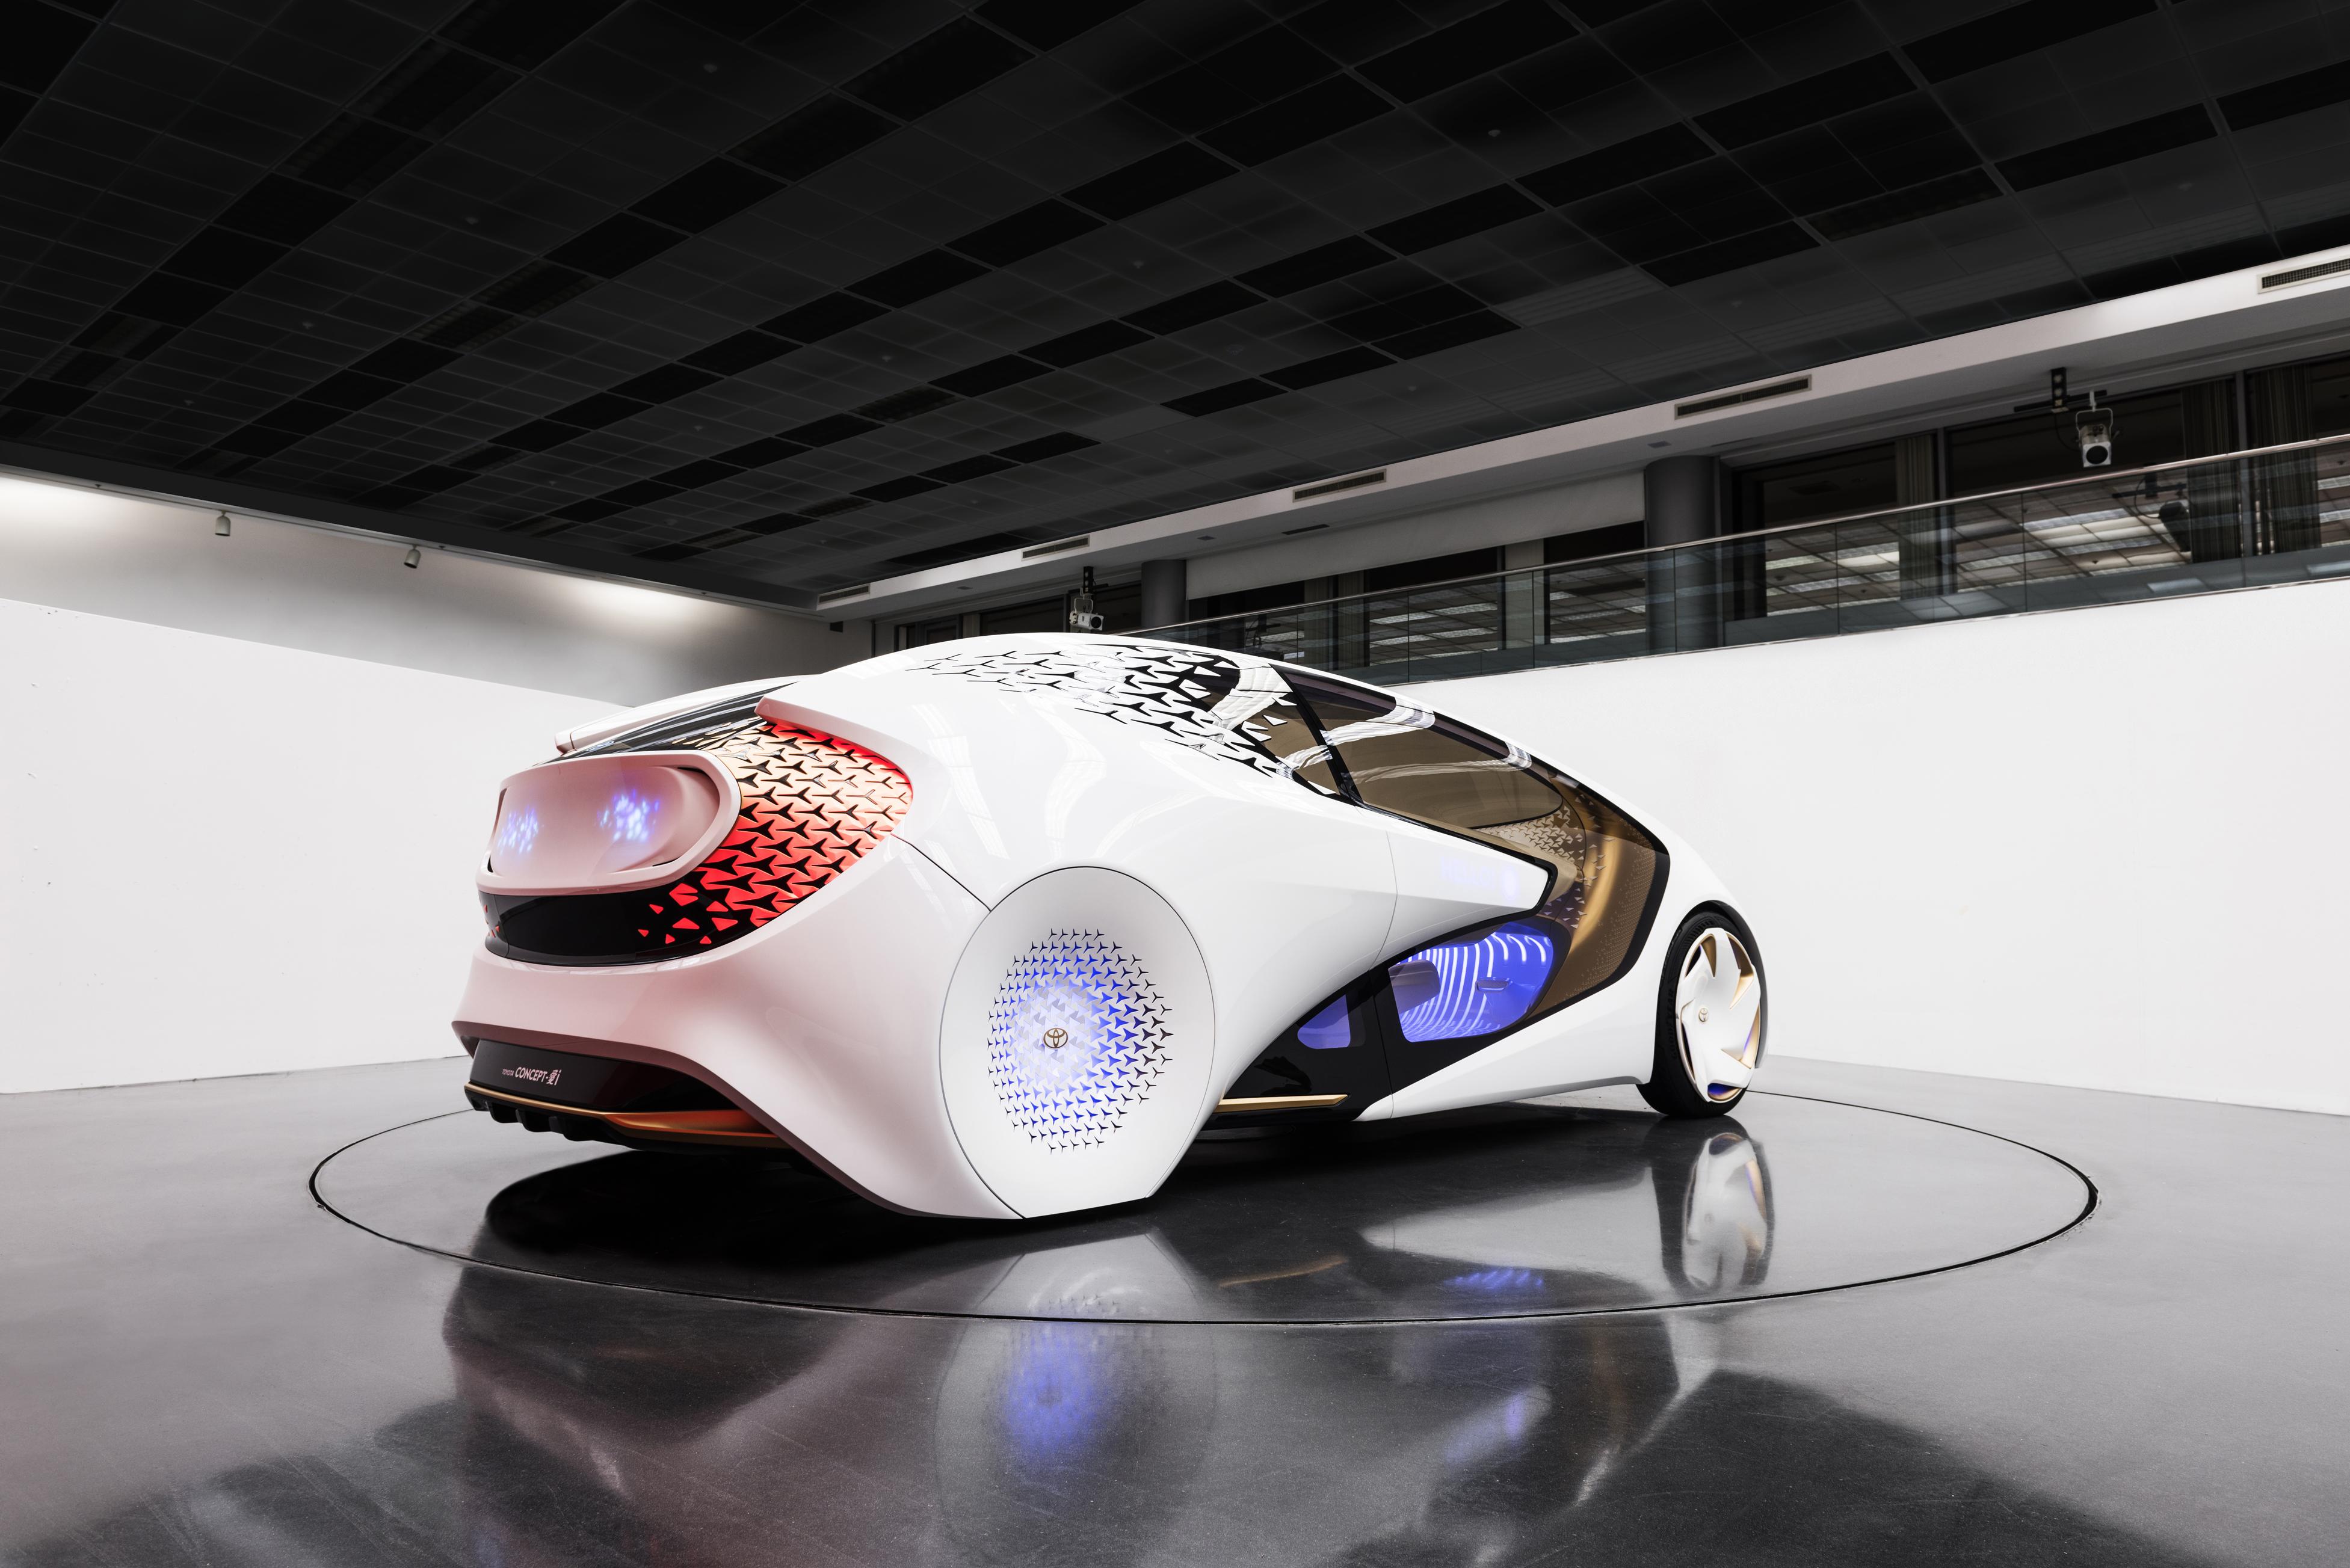 future cars 2020 - HD1600×1067